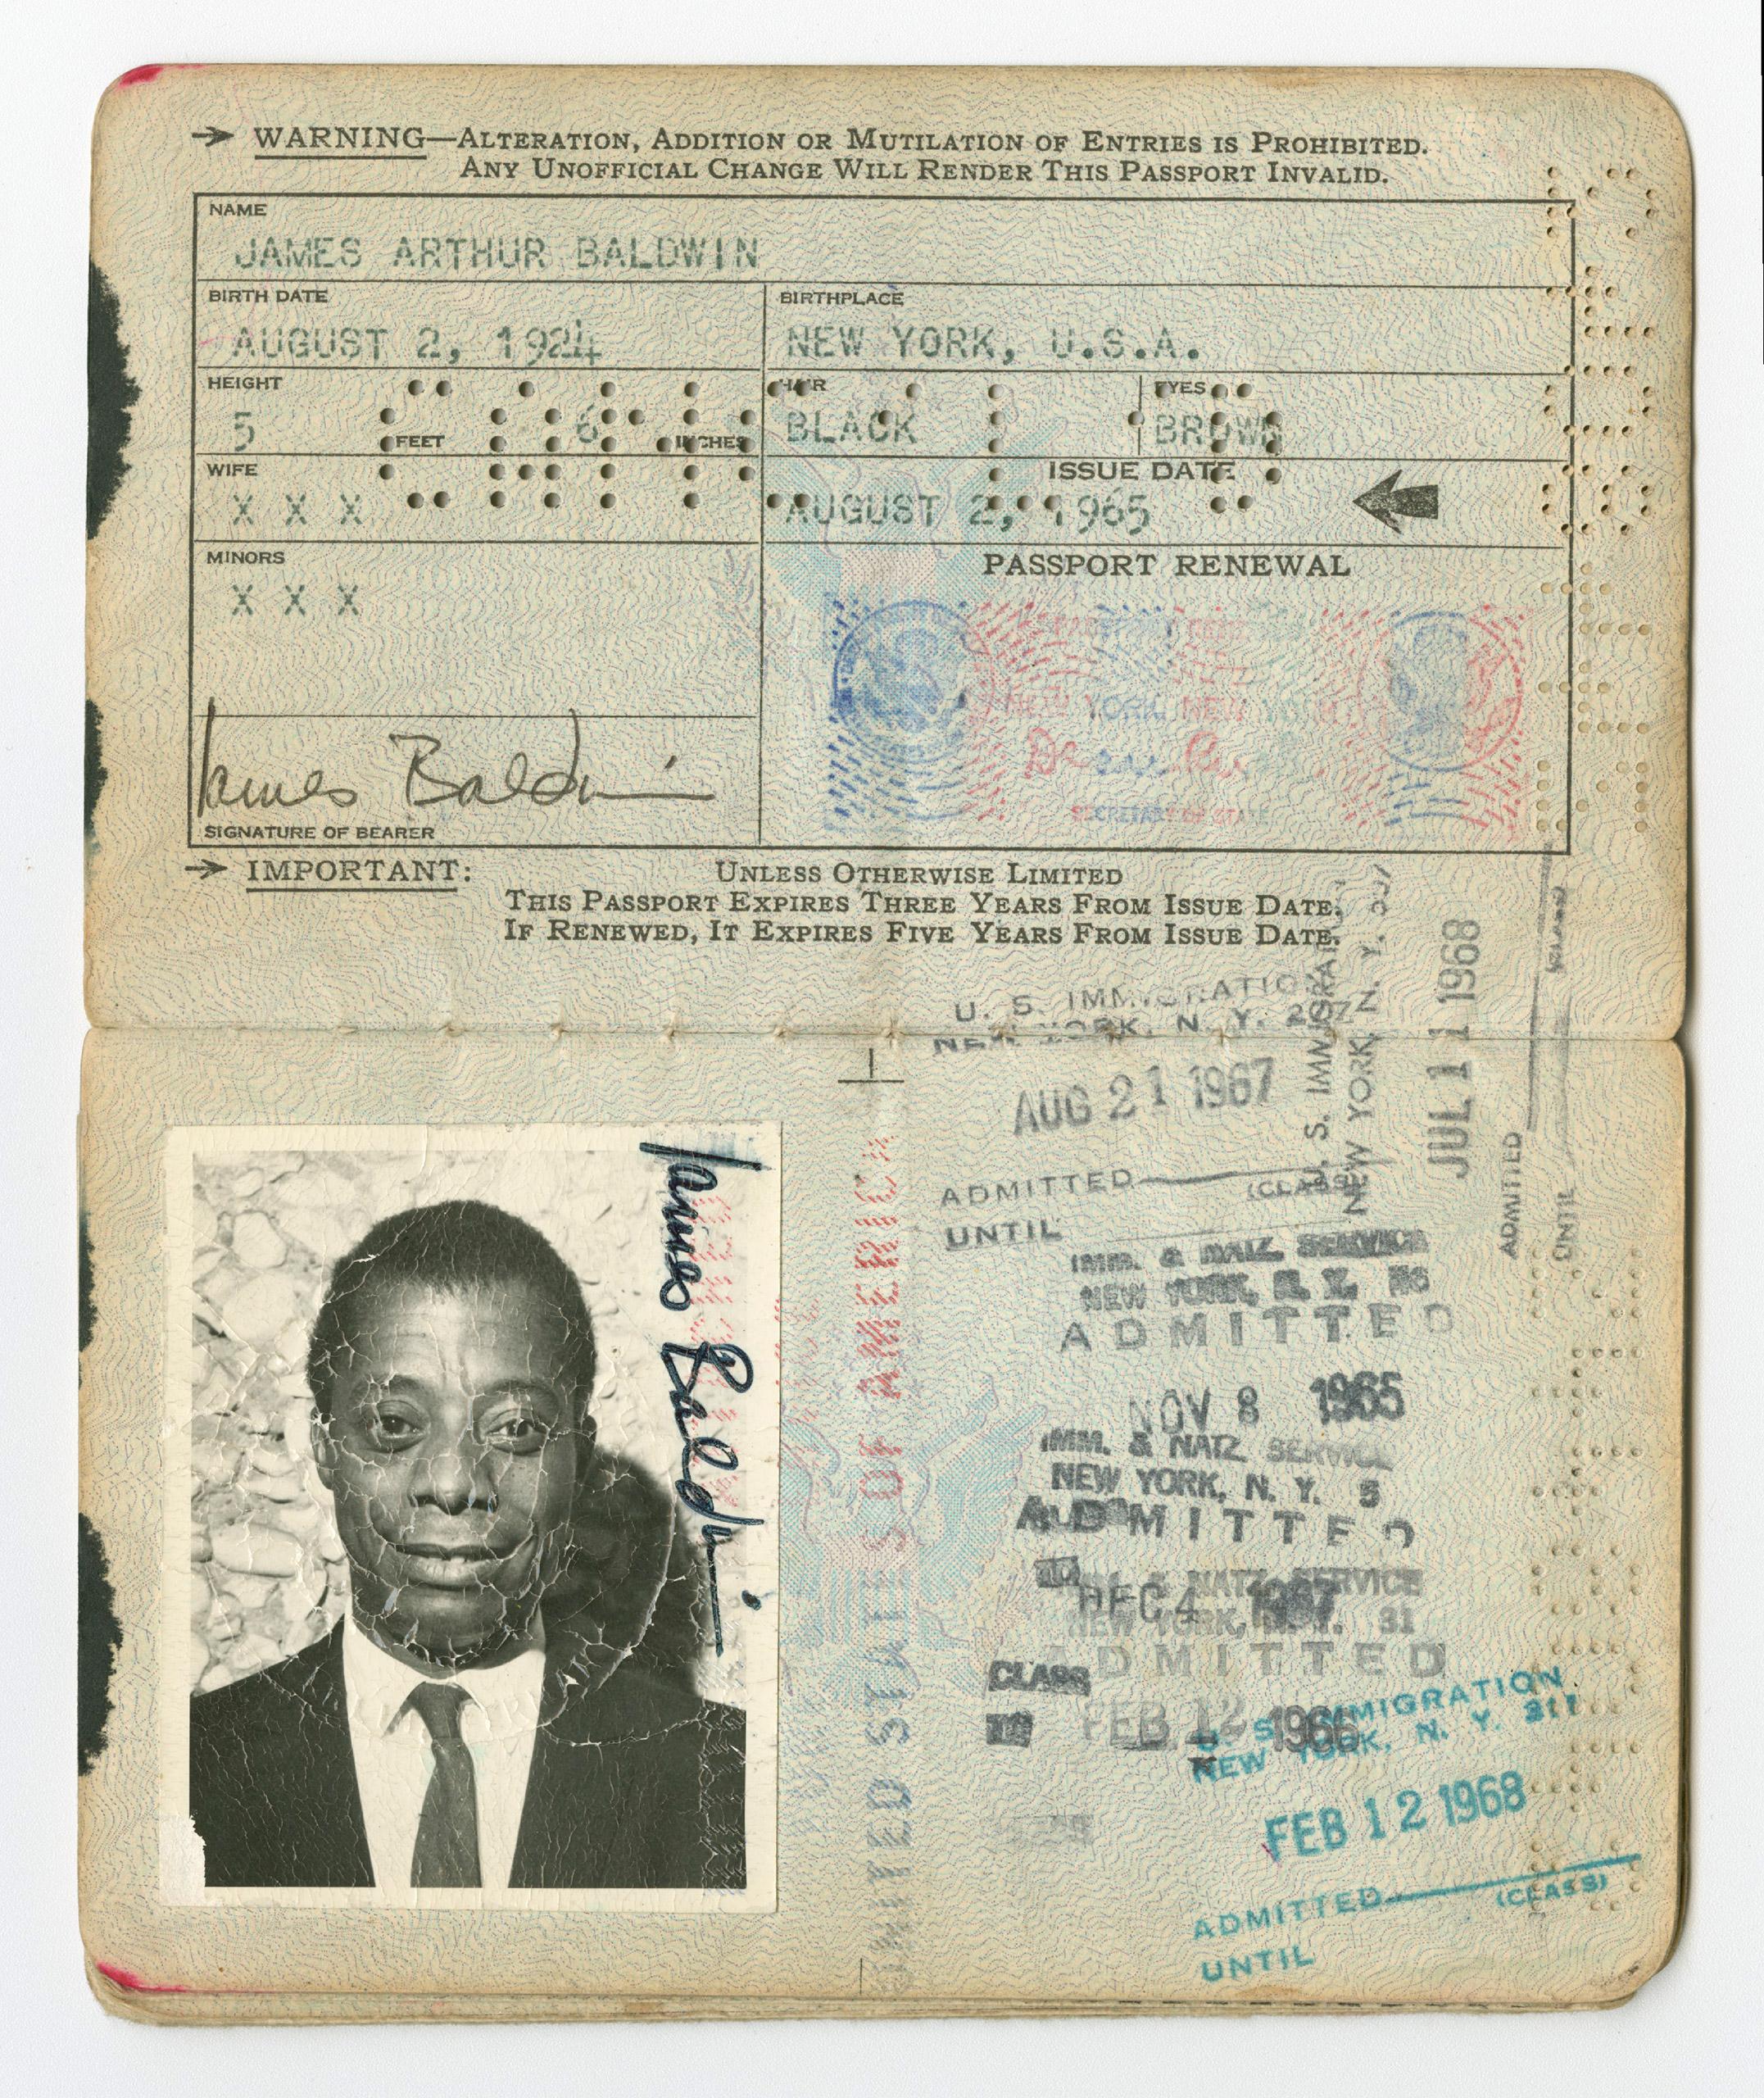 United States passport belonging to James Baldwin, issued Aug. 2, 1965.